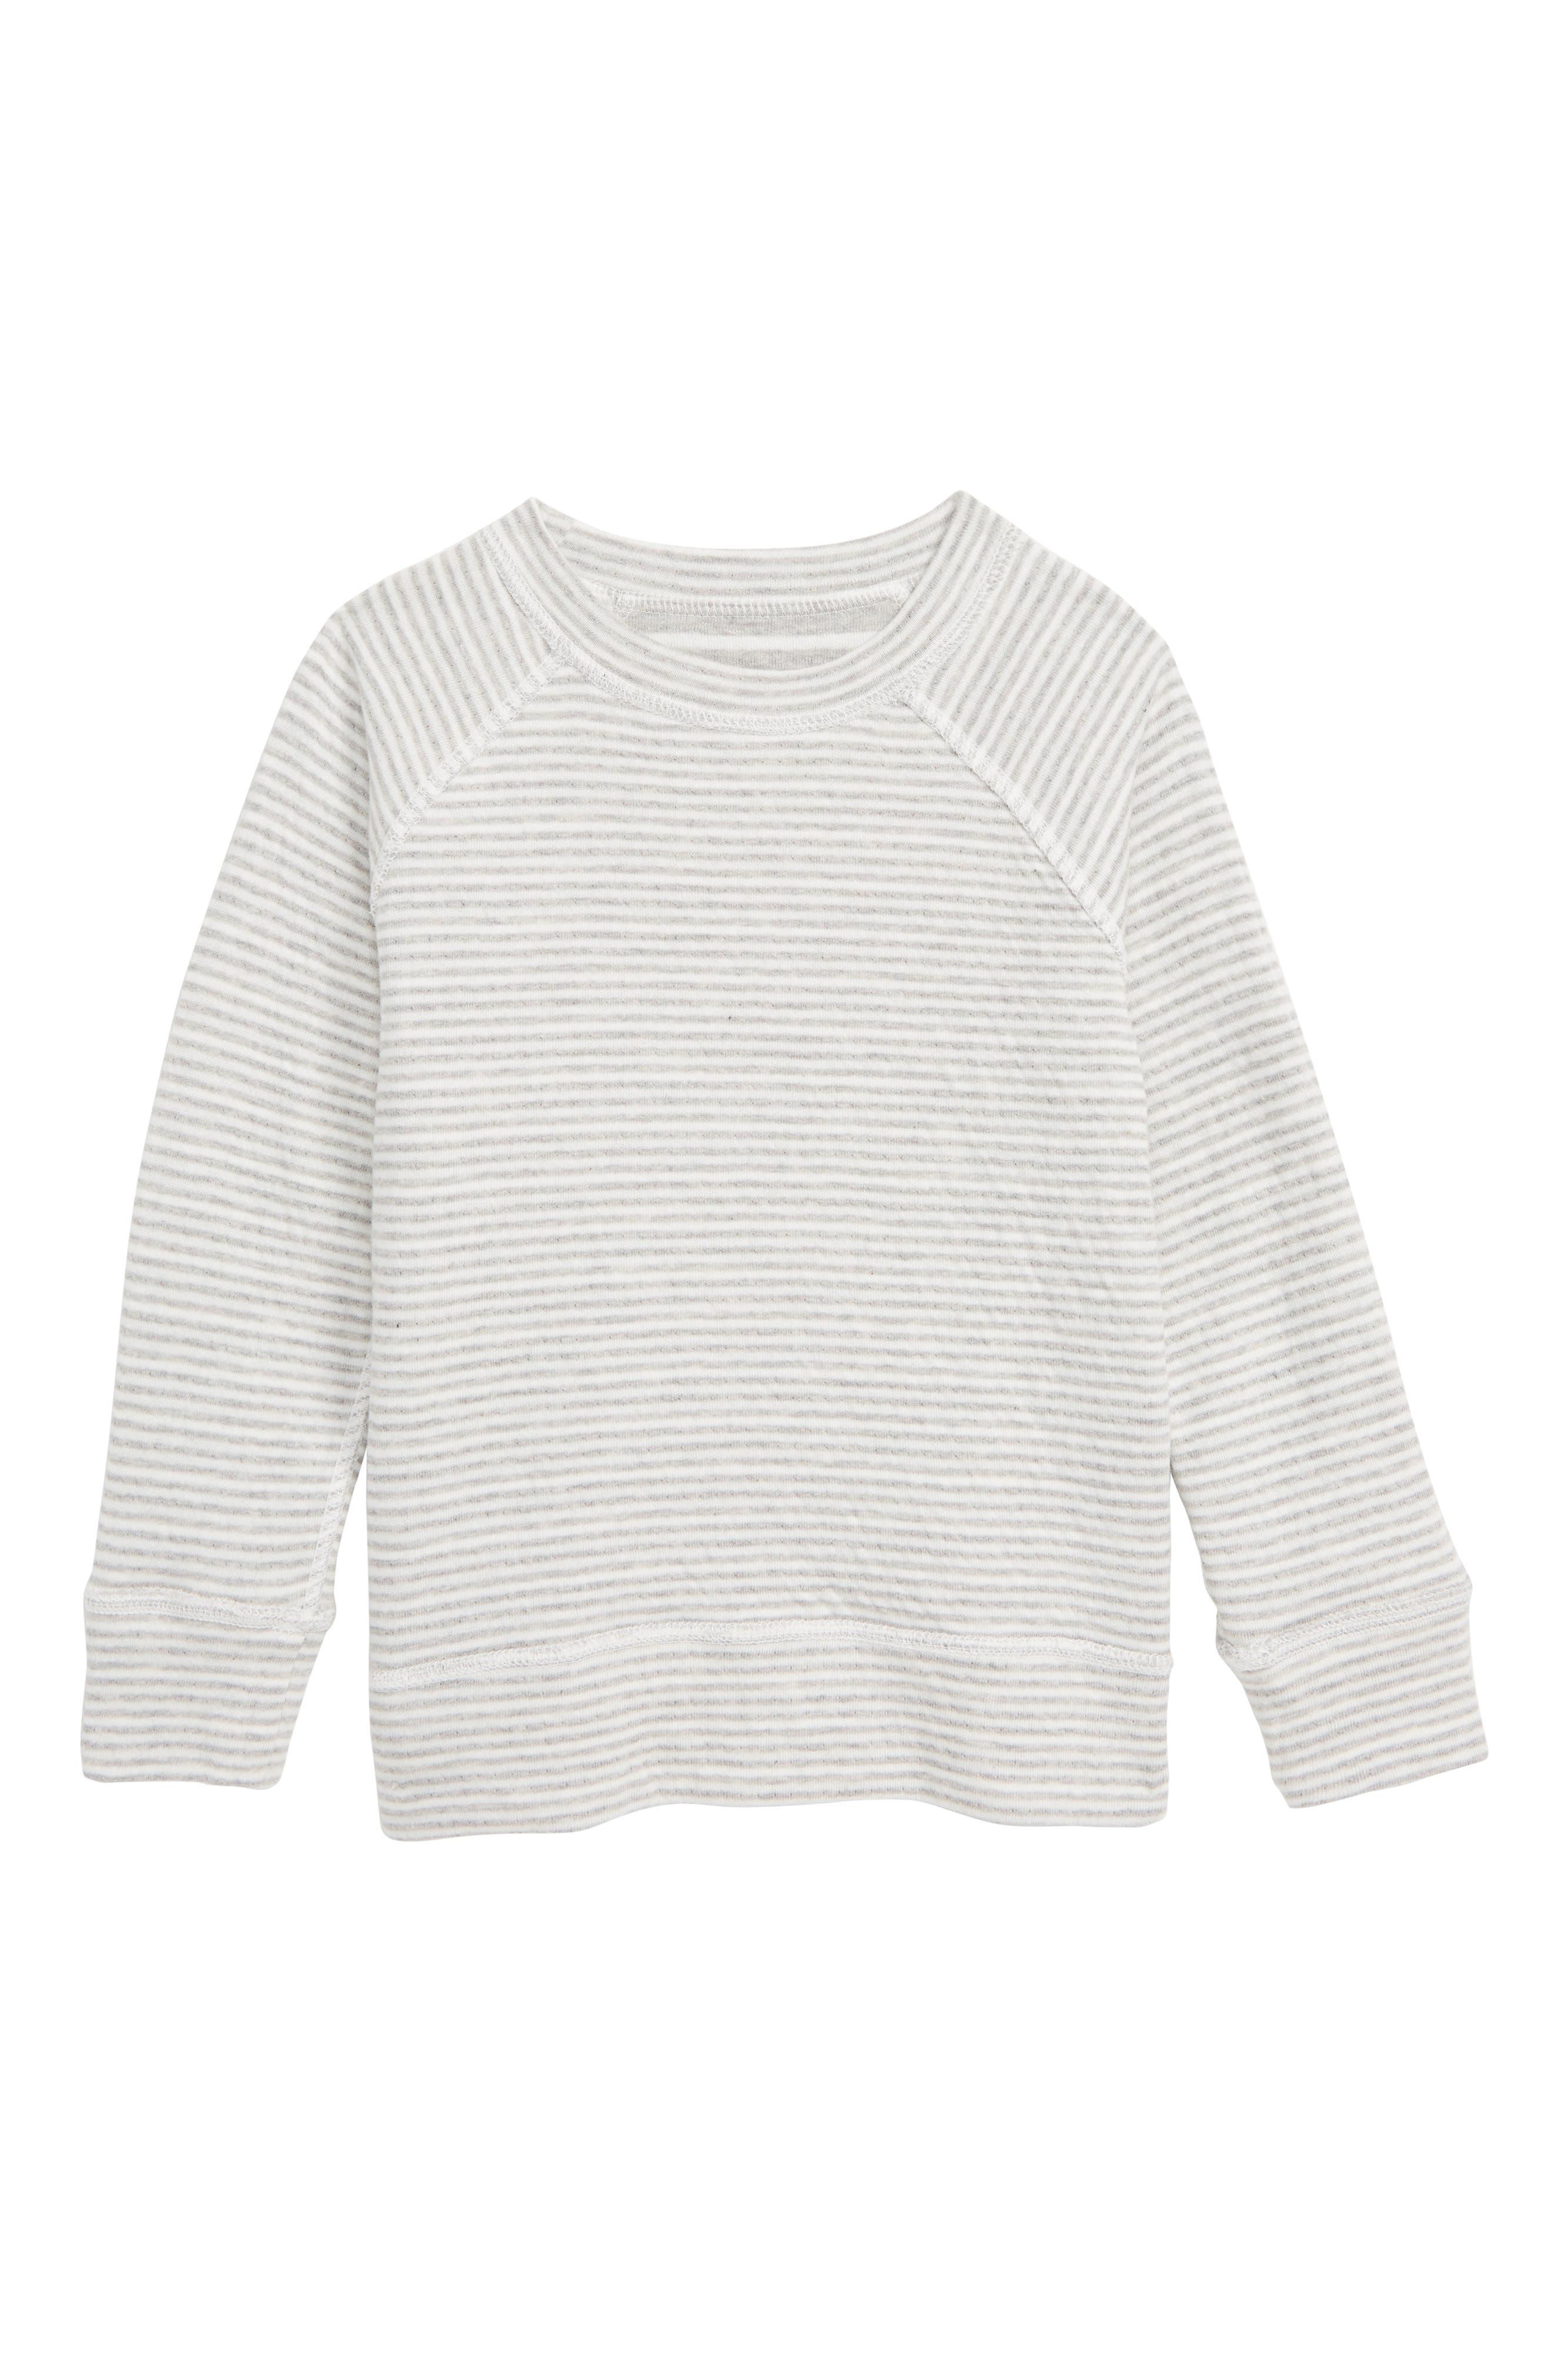 Double Layer Reversible T-Shirt,                             Alternate thumbnail 2, color,                             GREY MARL/ ECRU